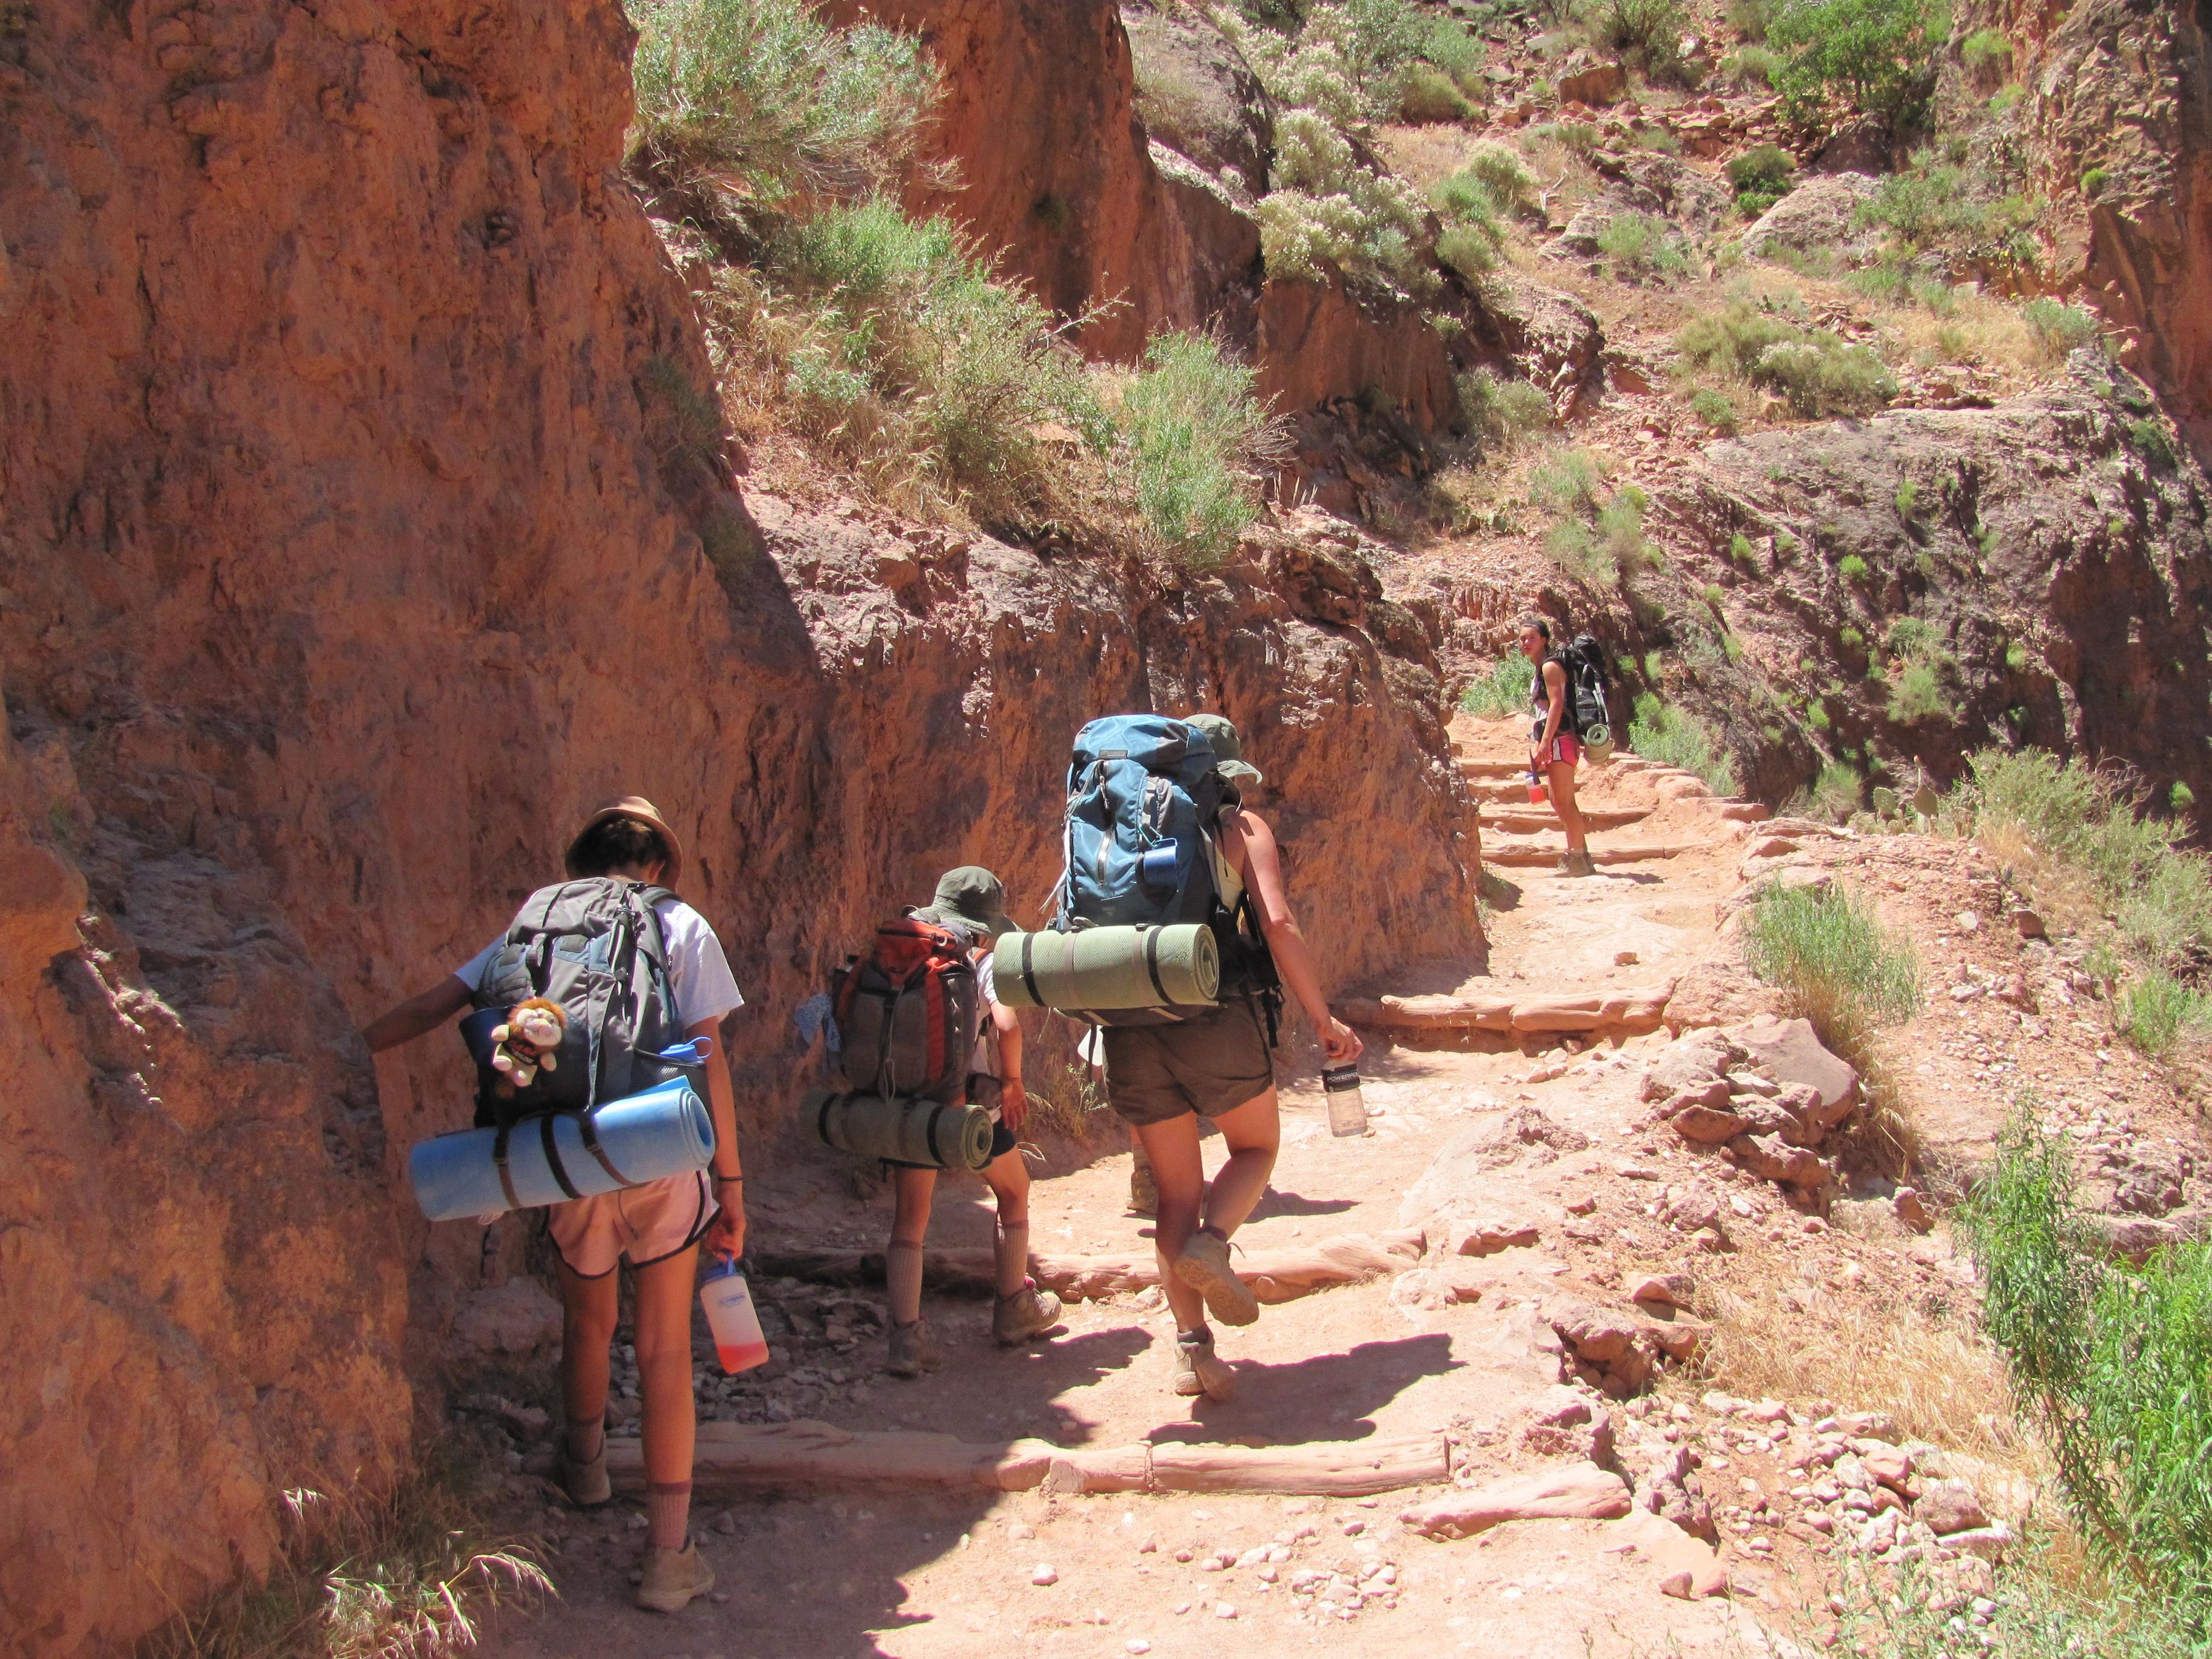 Hiking the Bright Angel Trail